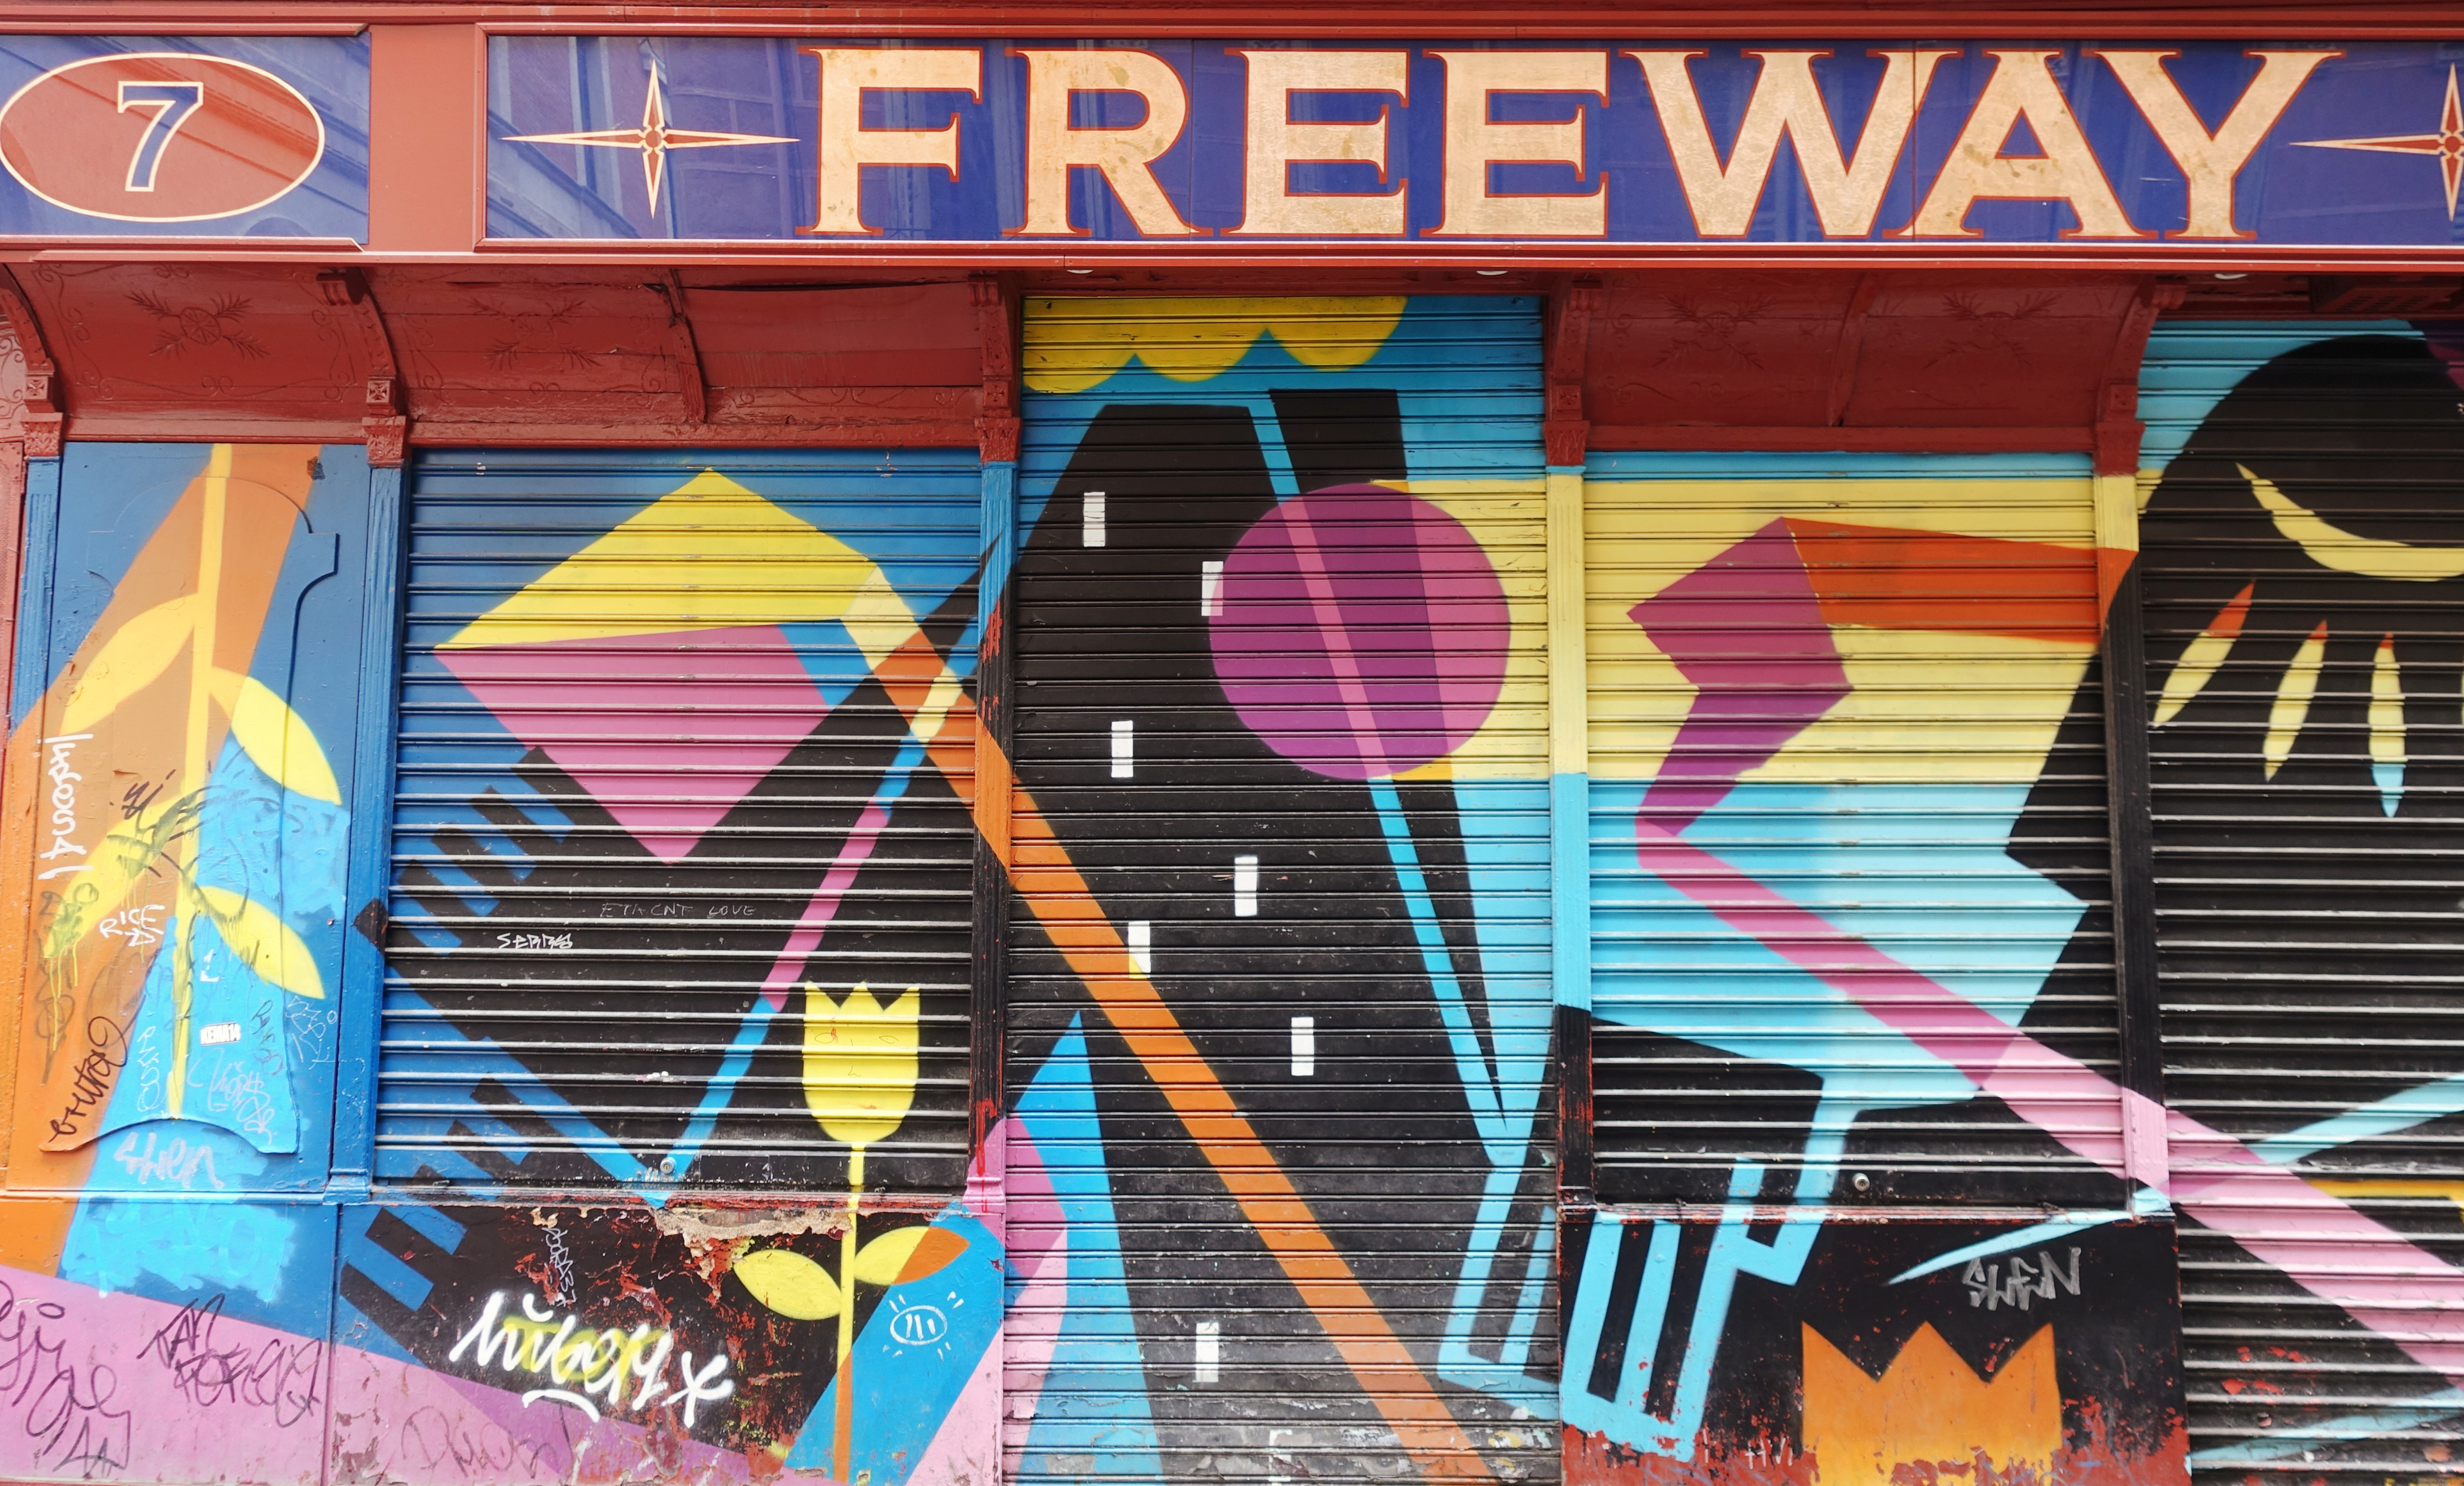 street-art-madrid-blog-de-moda-Chicadicta-influencer-PiensaenChic-arte-urbano-malasana-chic-adicta-Piensa-en-Chic